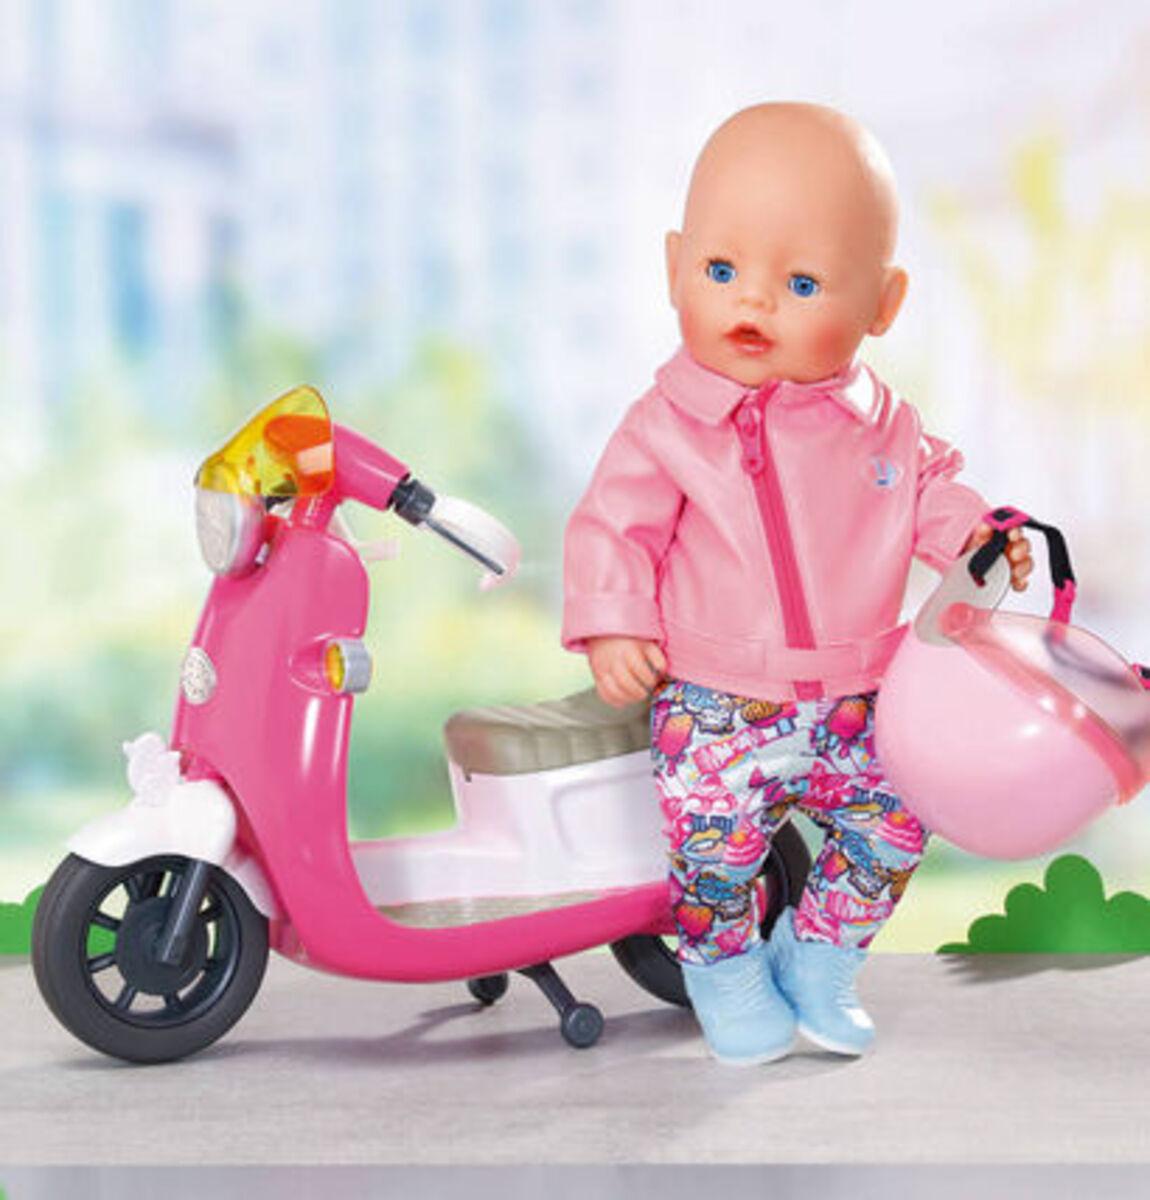 Bild 4 von Zapf Creation® BABY born®City Deluxe Scooter Outfit